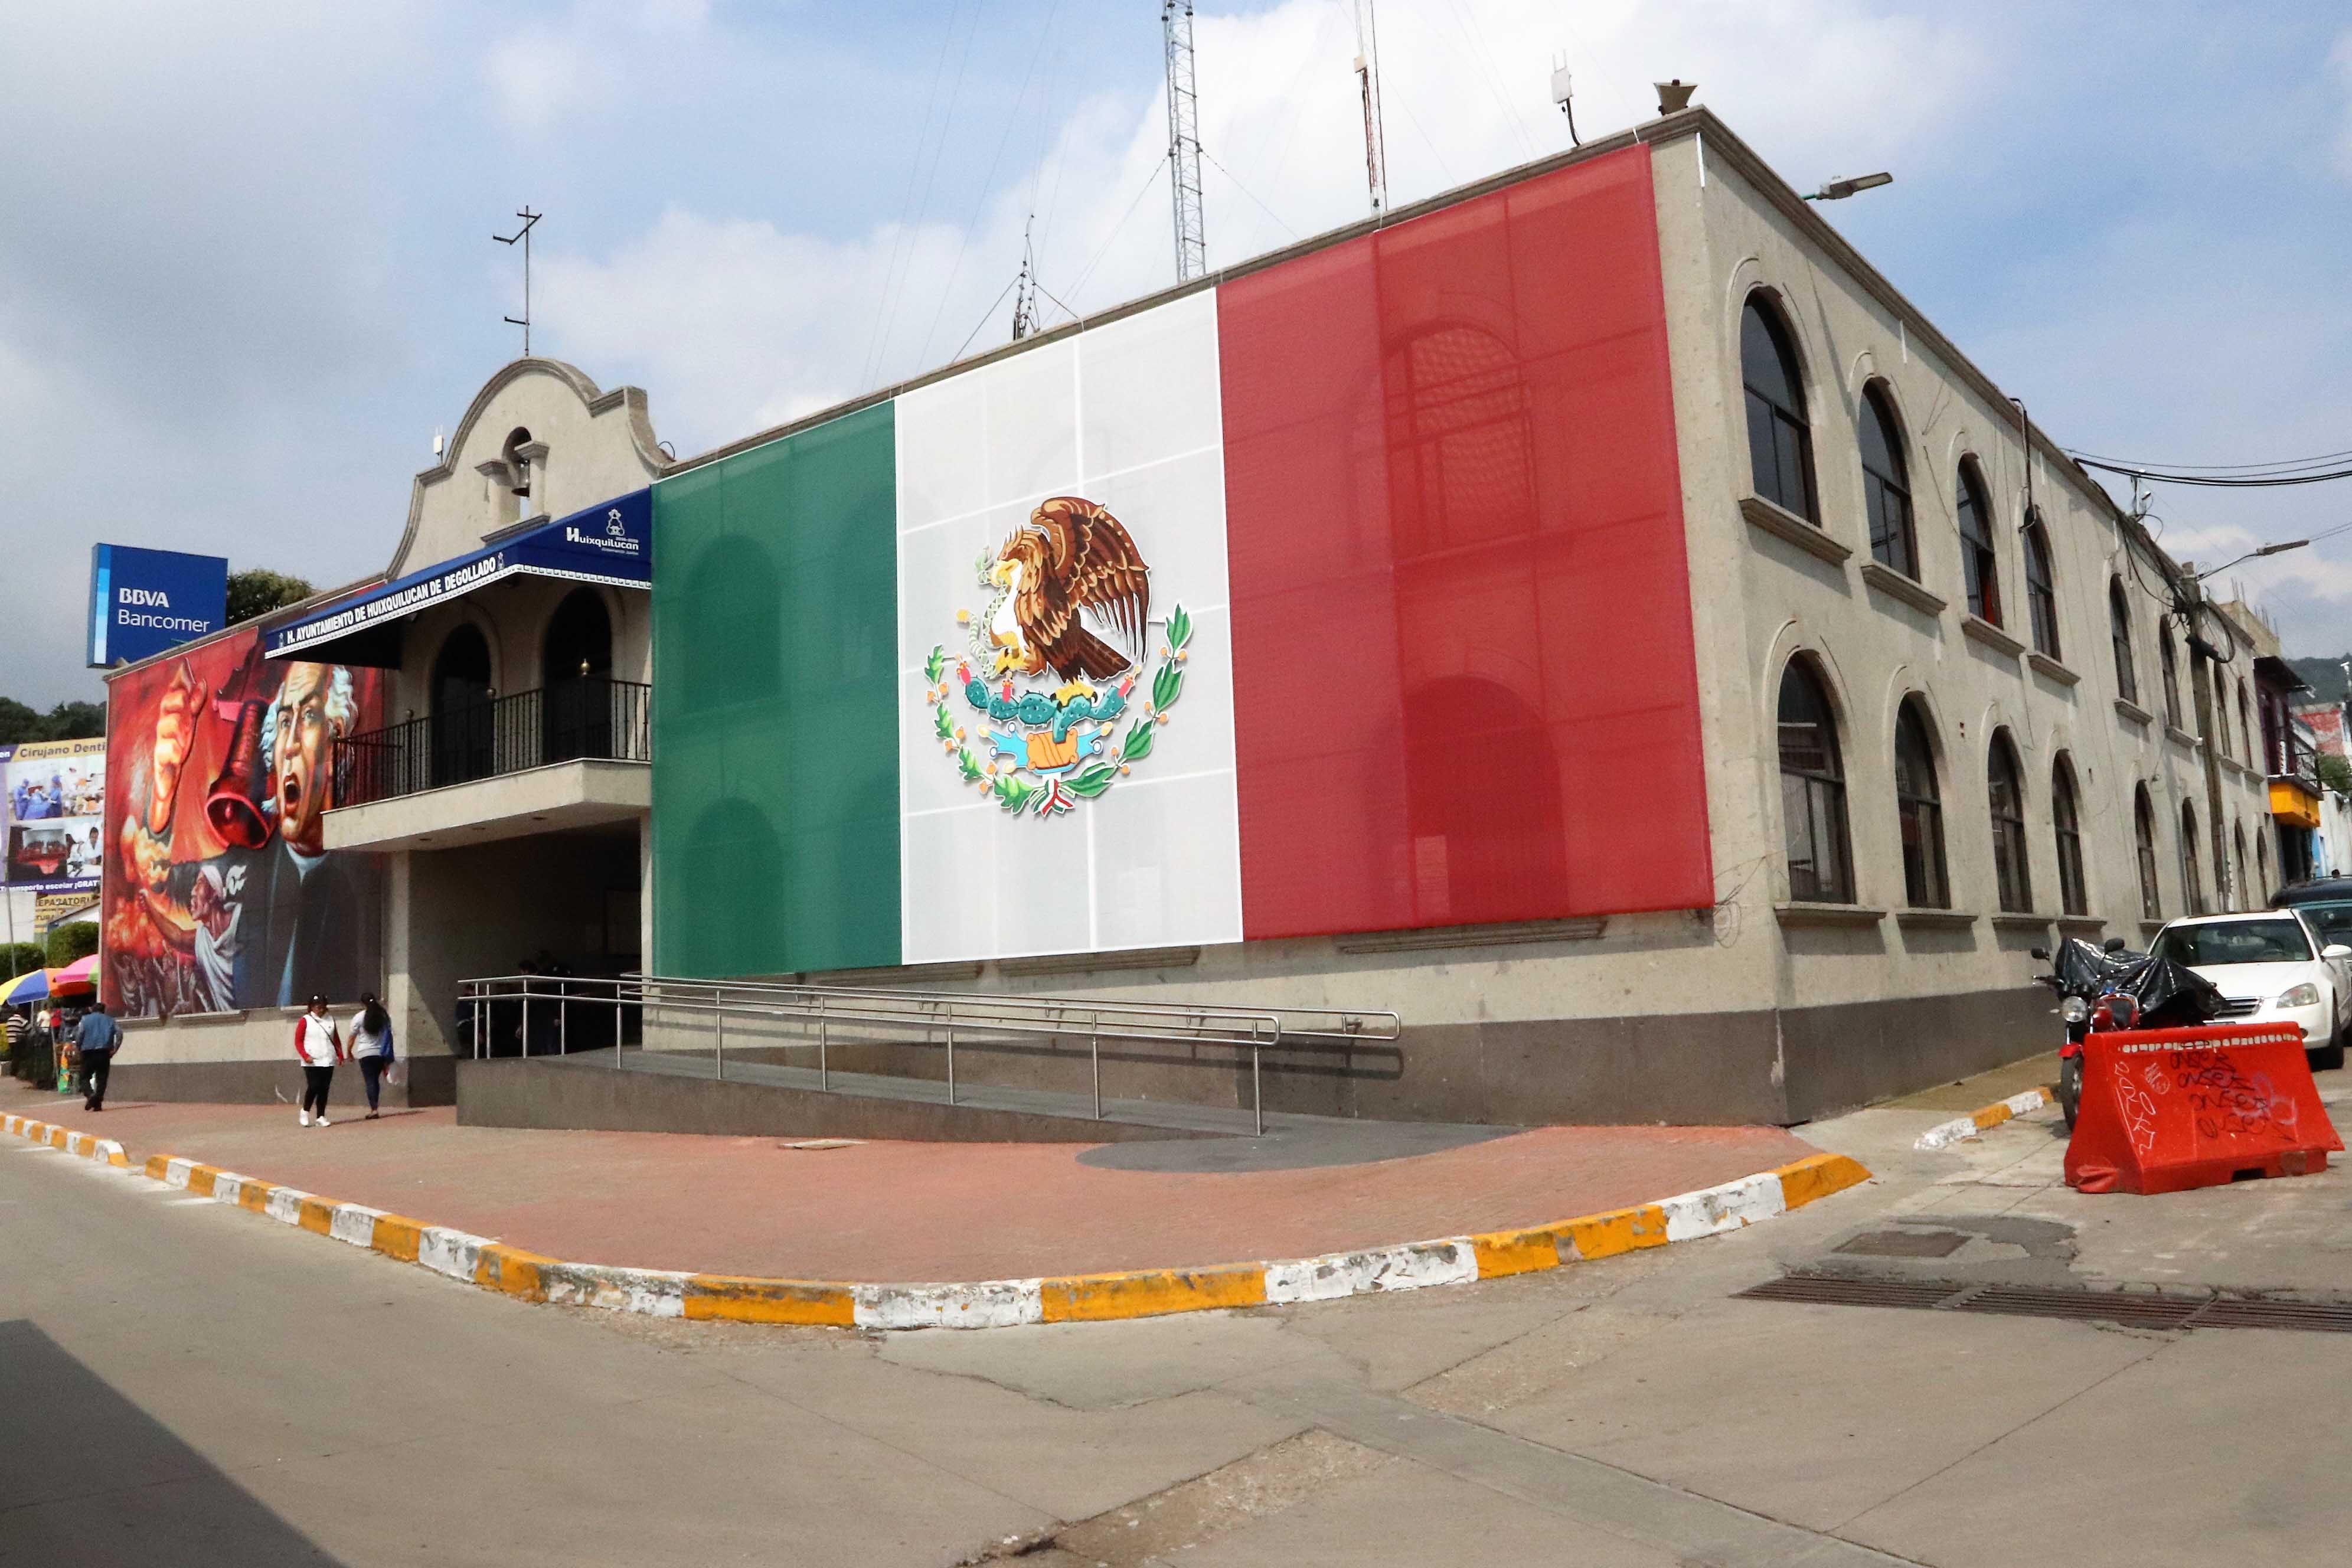 Omiten Fiestas Patrias en Huixquilucan por pandemia